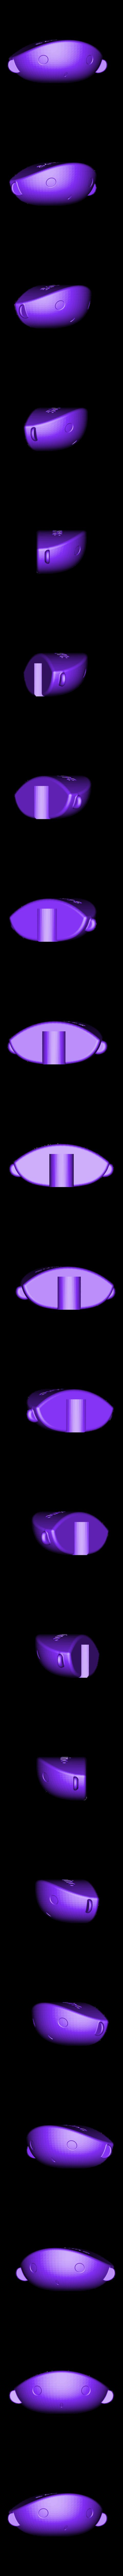 86Duino-Kiki-b.STL Download free STL file Little Twin Stars / リトルツインスターズ / 雙子星 -- Kiki(キキ) • 3D printing design, 86Duino